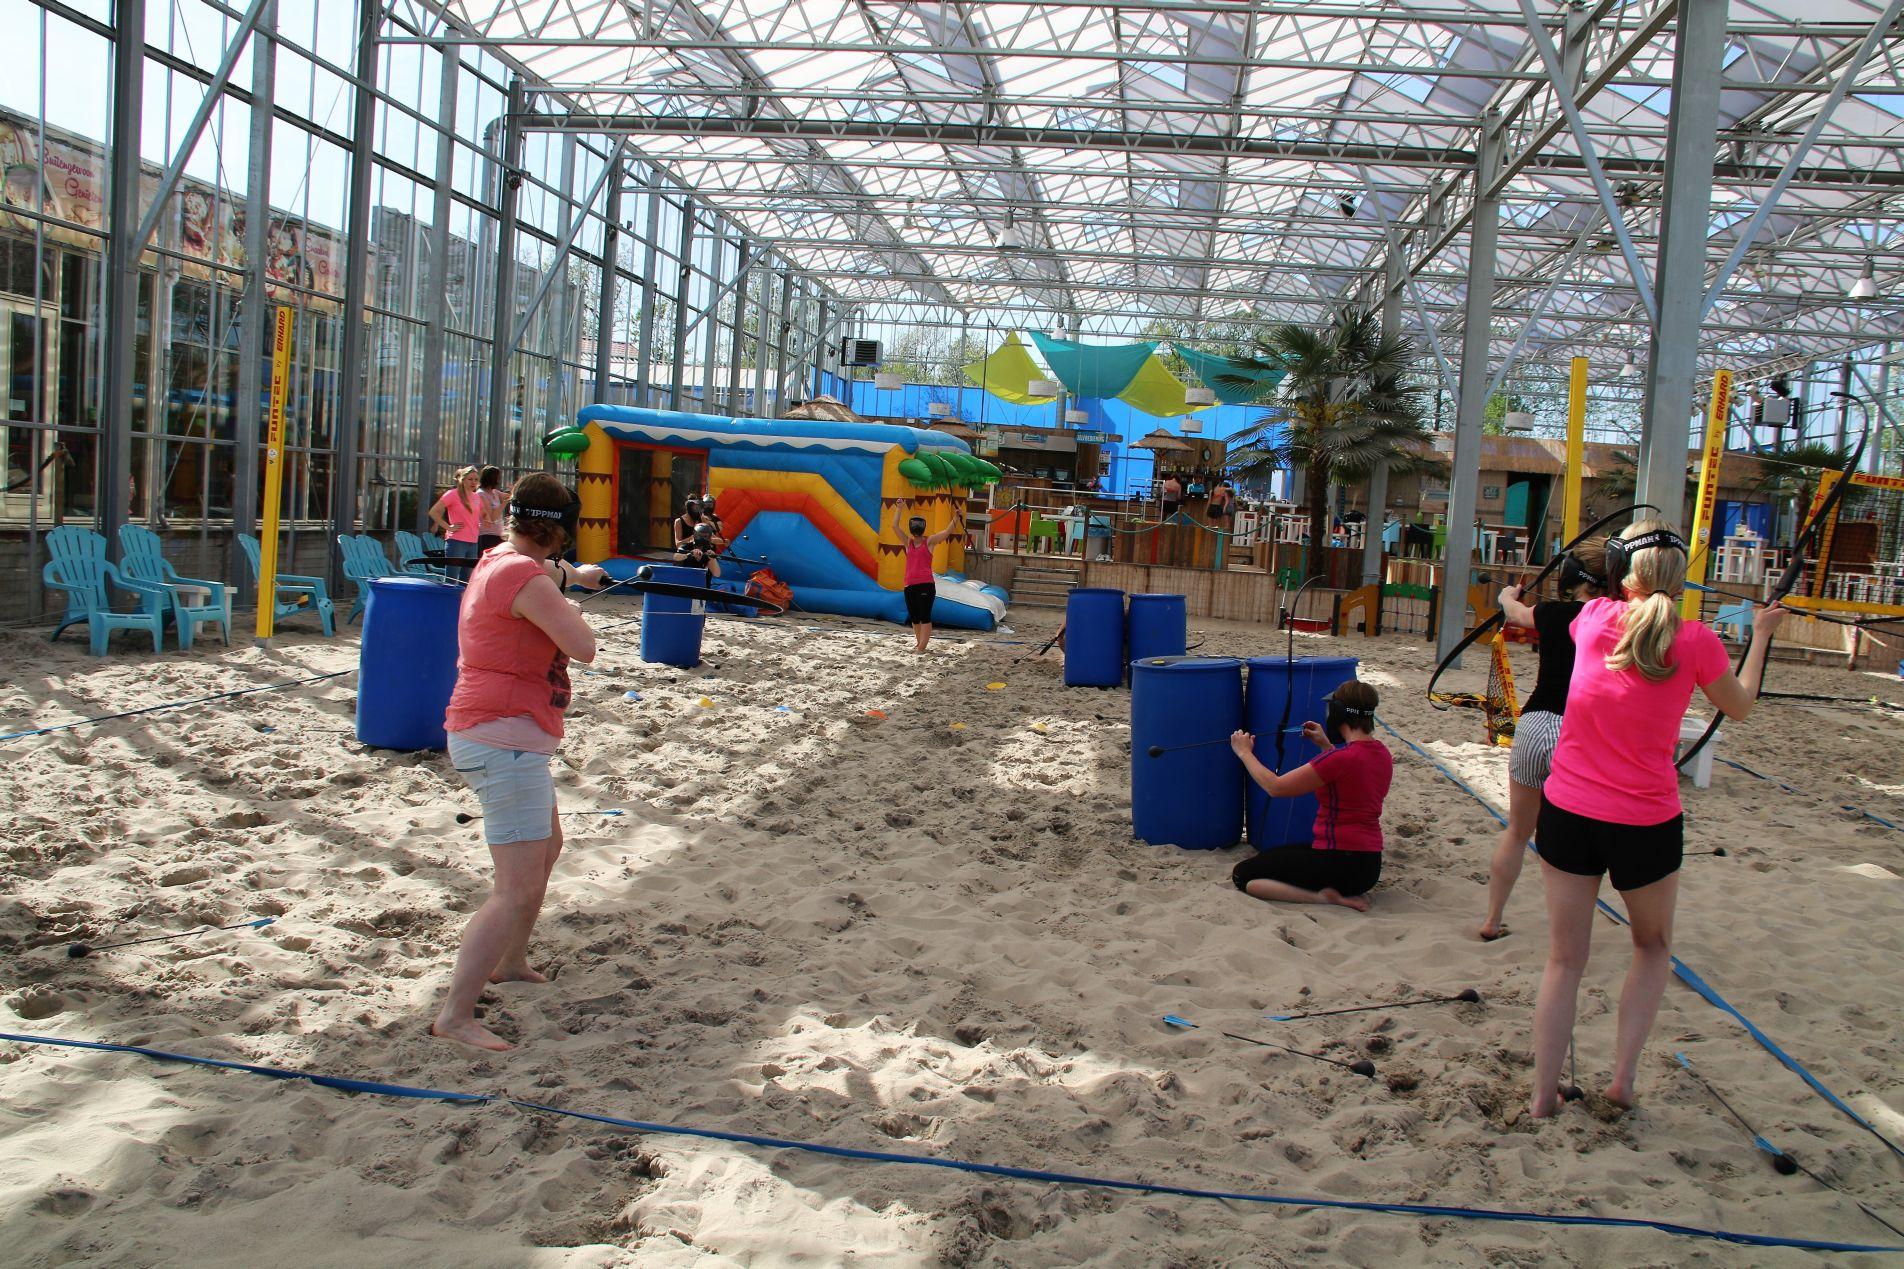 Tienercamping in Nederland met verrassende strandvakantie! - tienercamping in Nederland